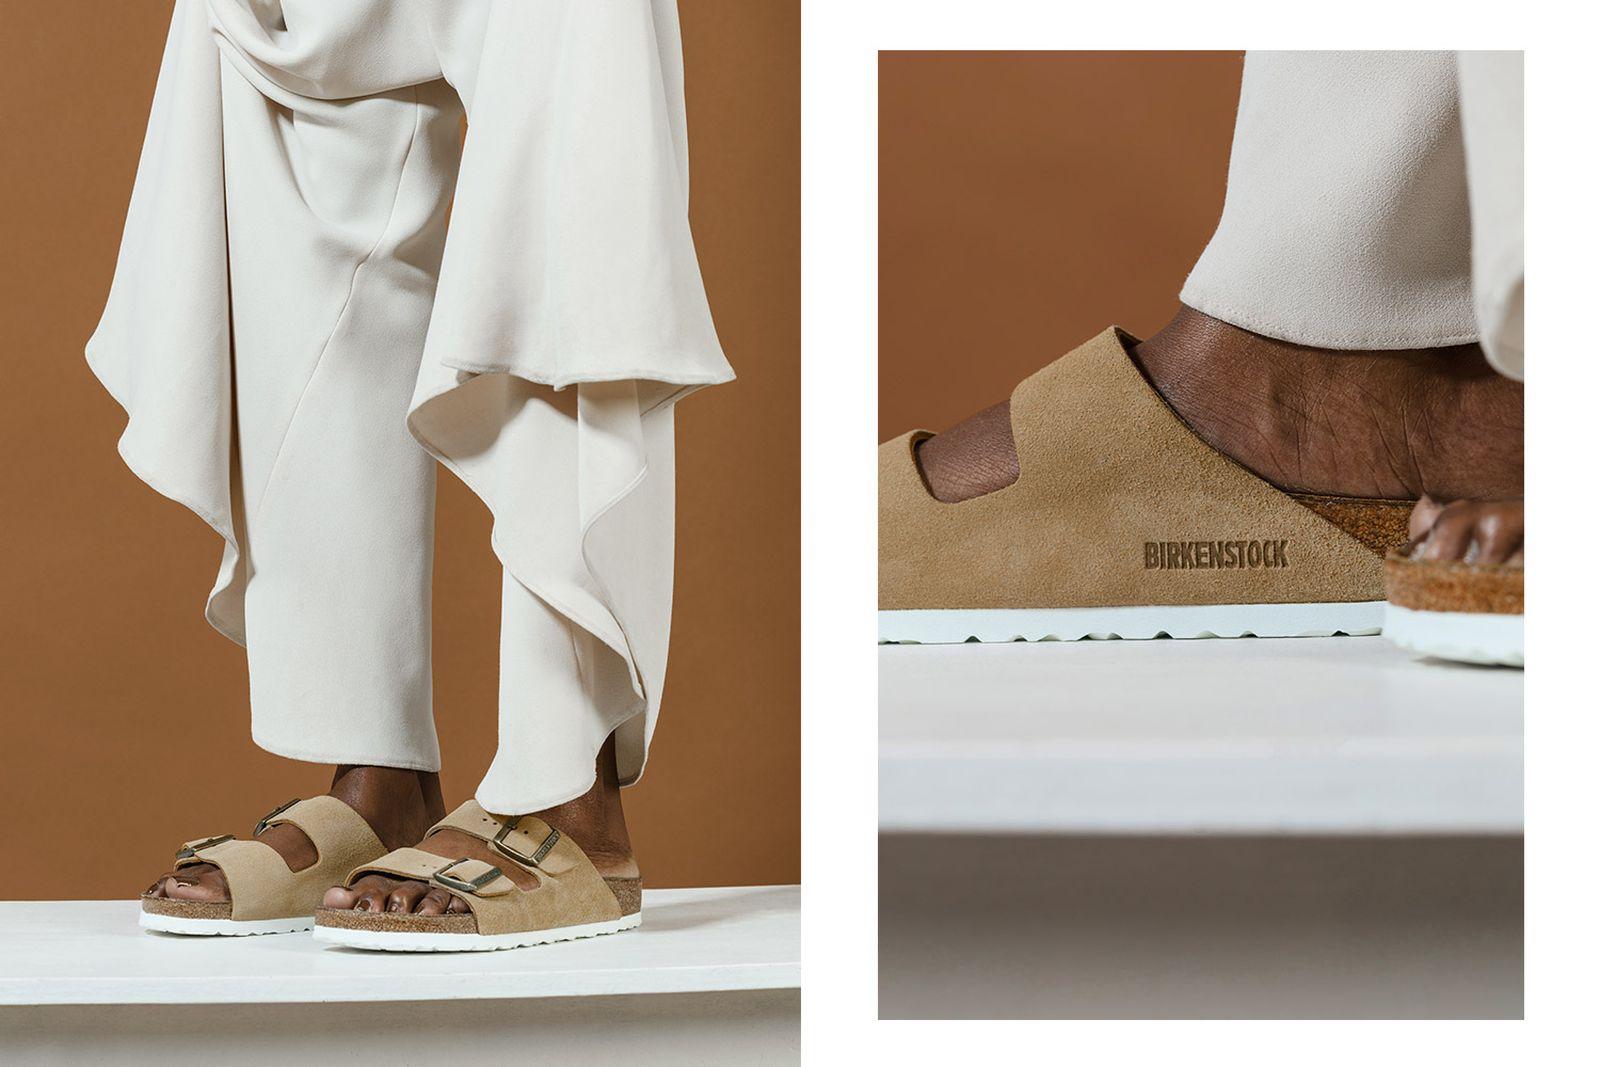 birkenstock-sandals-history-design-fashion-07